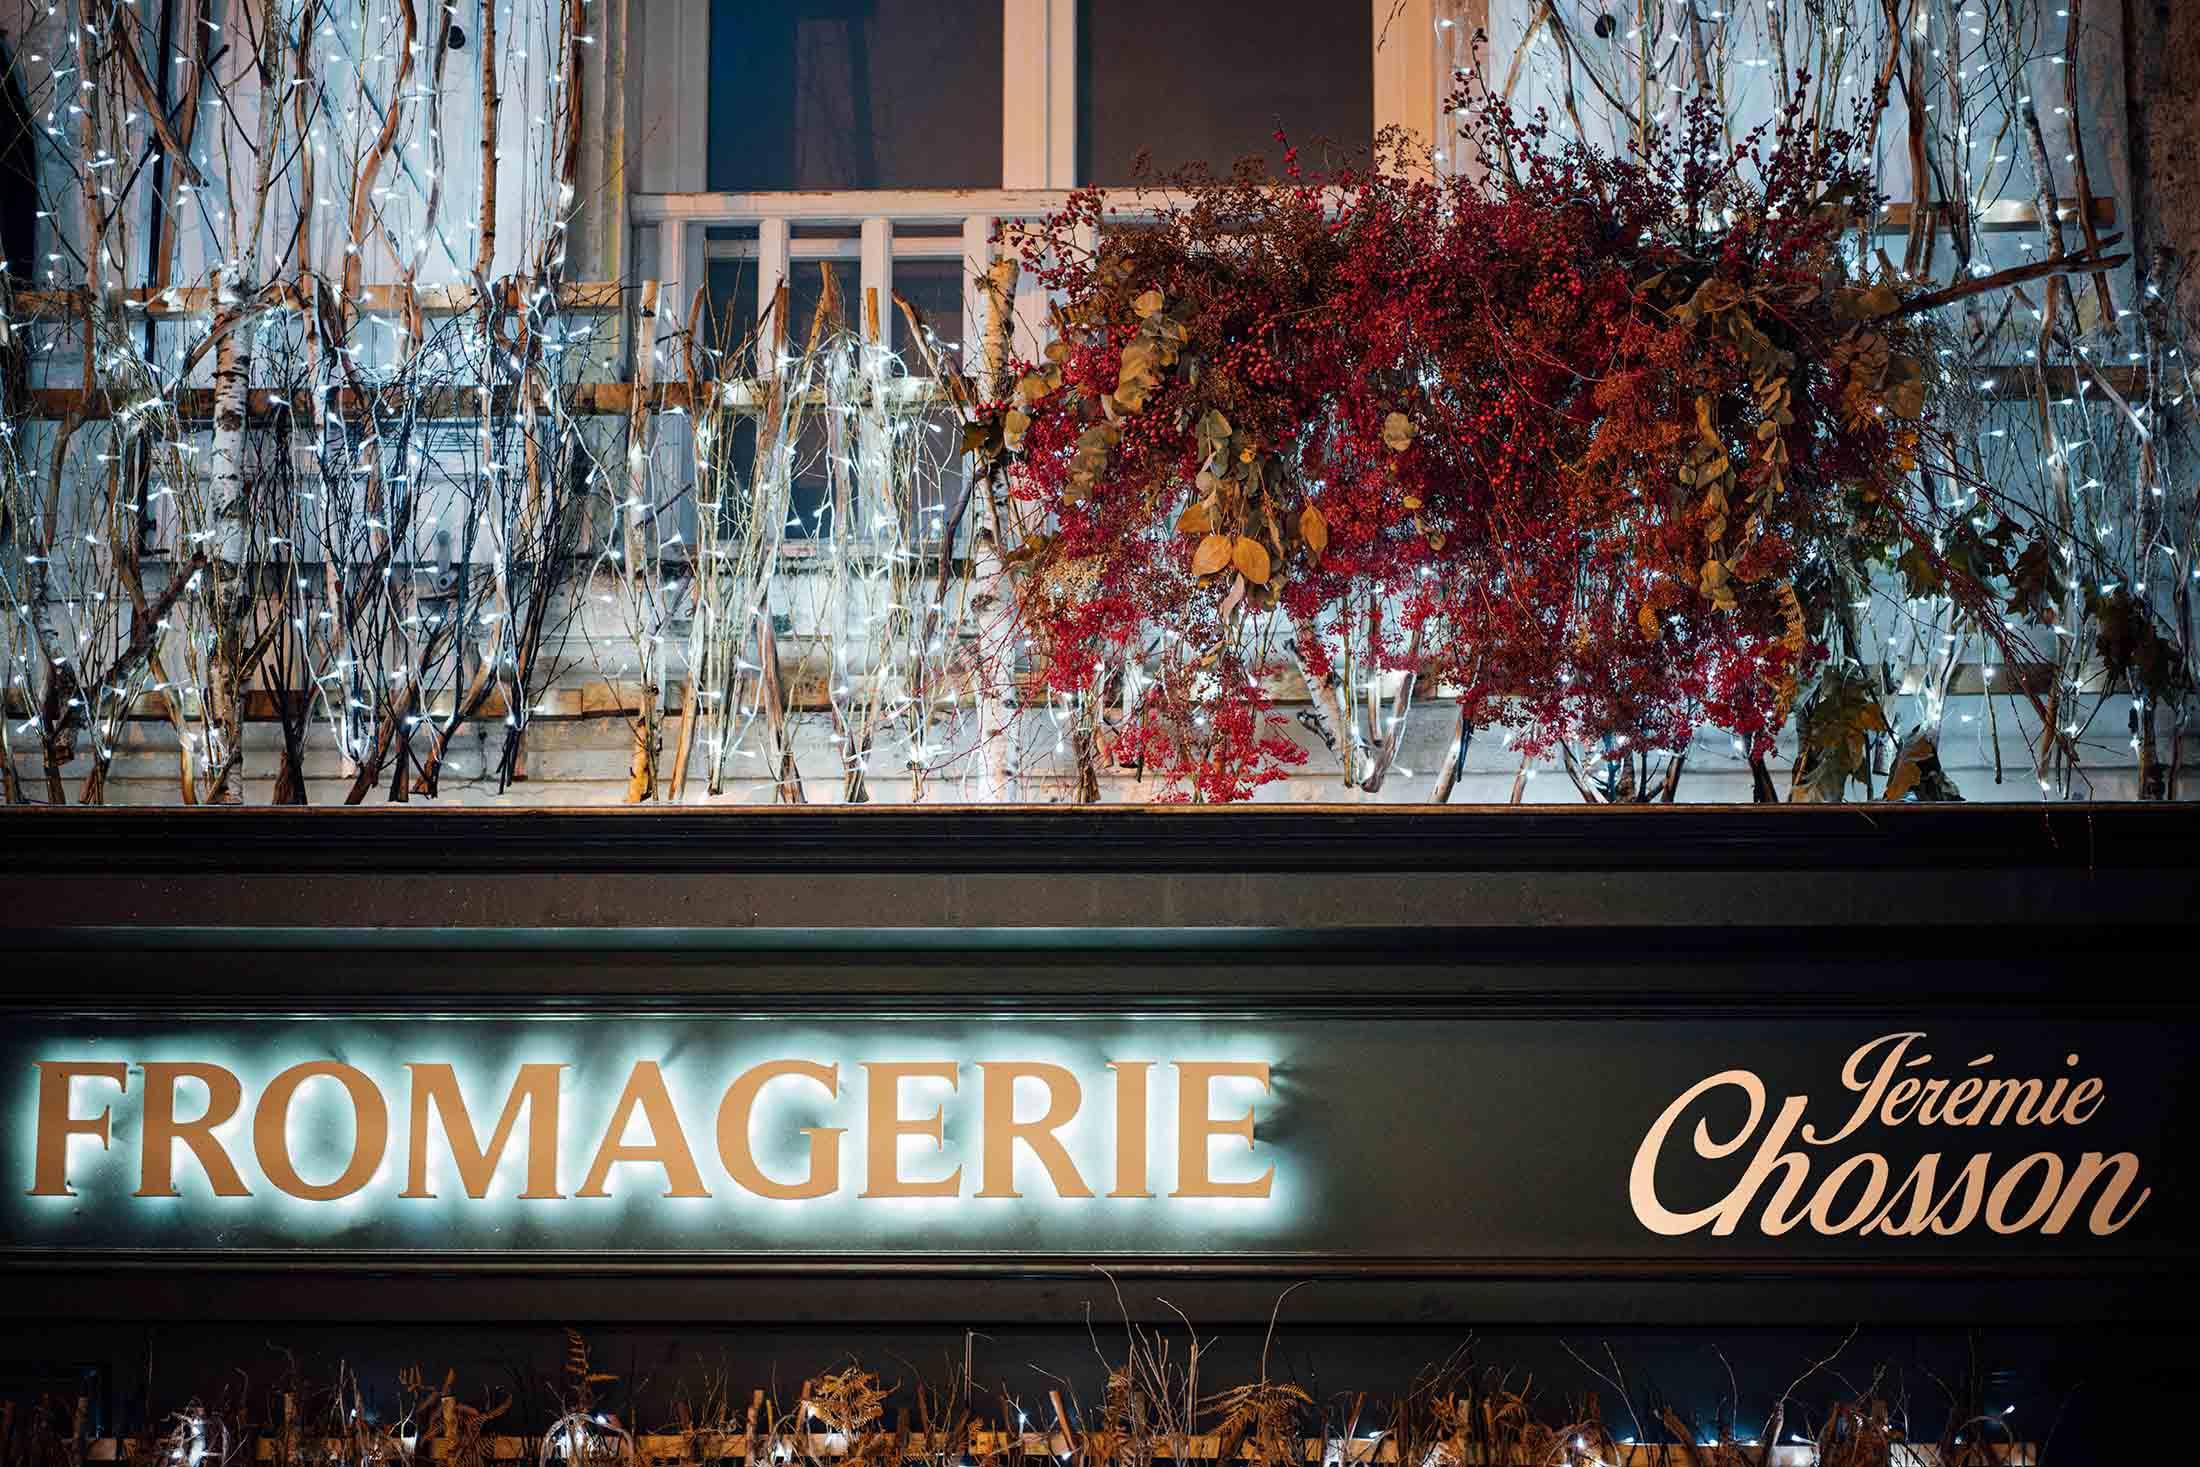 decoration-noel-rouge-eduadecore-photo-ludozme-fromagerie-jeremie-chosson-poitiers (48)